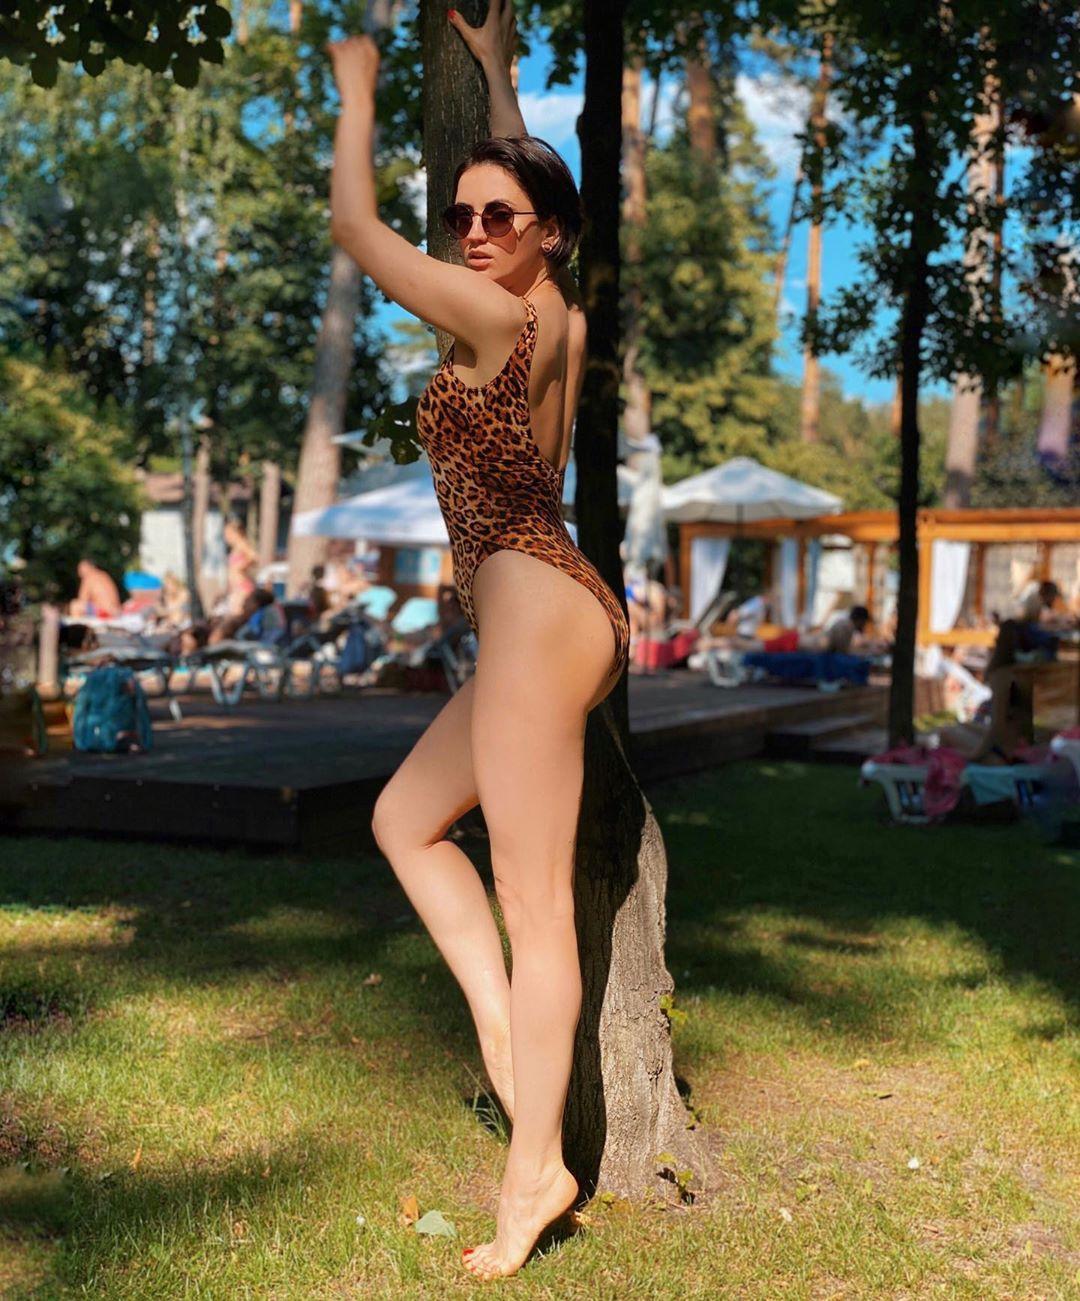 Оля удивила фанатов / фото instagram.com/cybulskaya